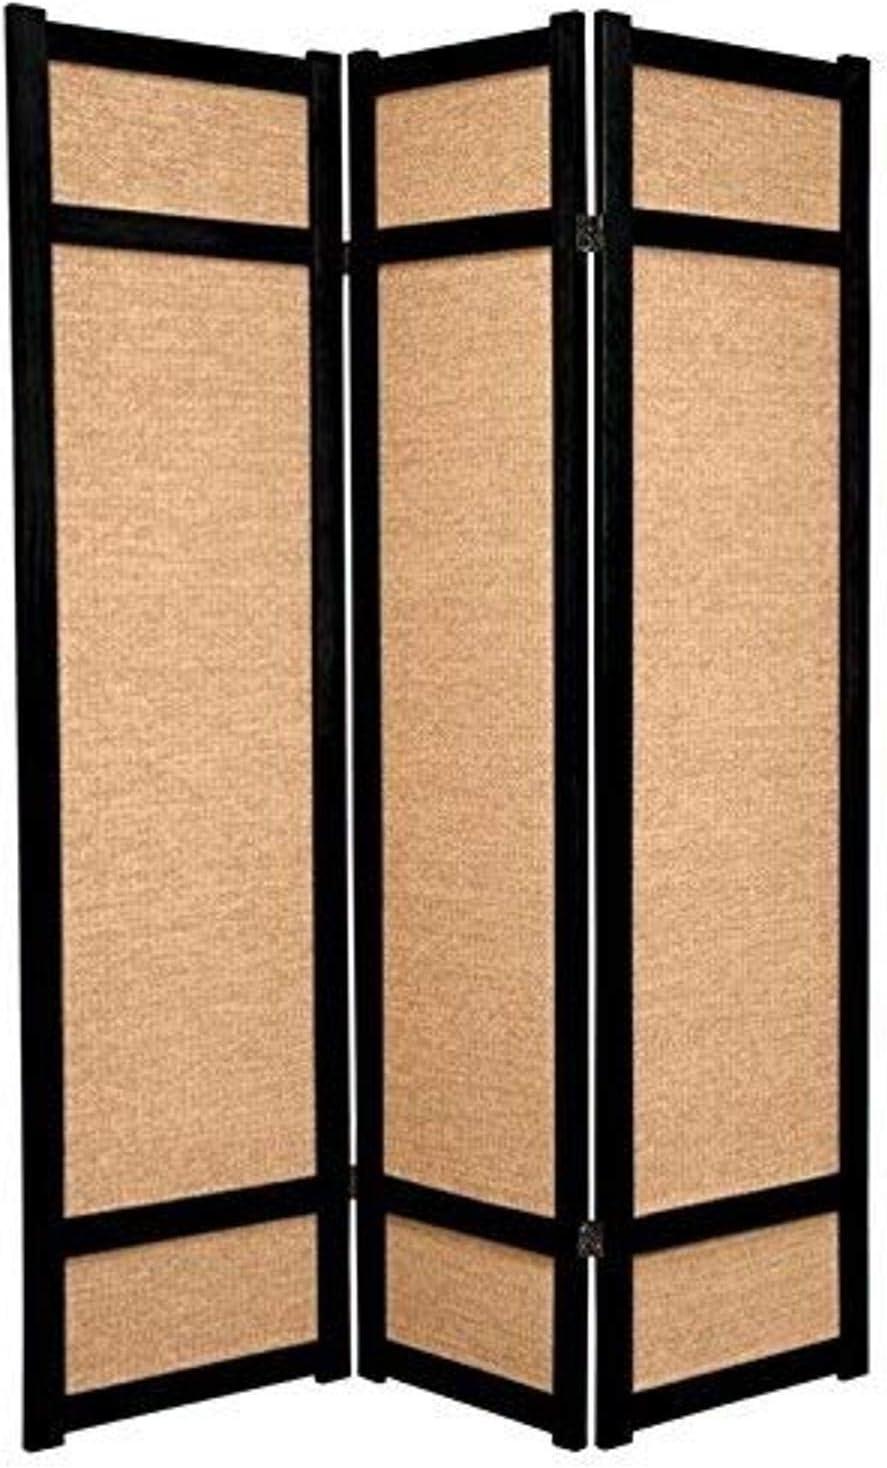 Oriental Furniture 6 ft. Tall Jute Shoji Screen - 3 Panel - Black